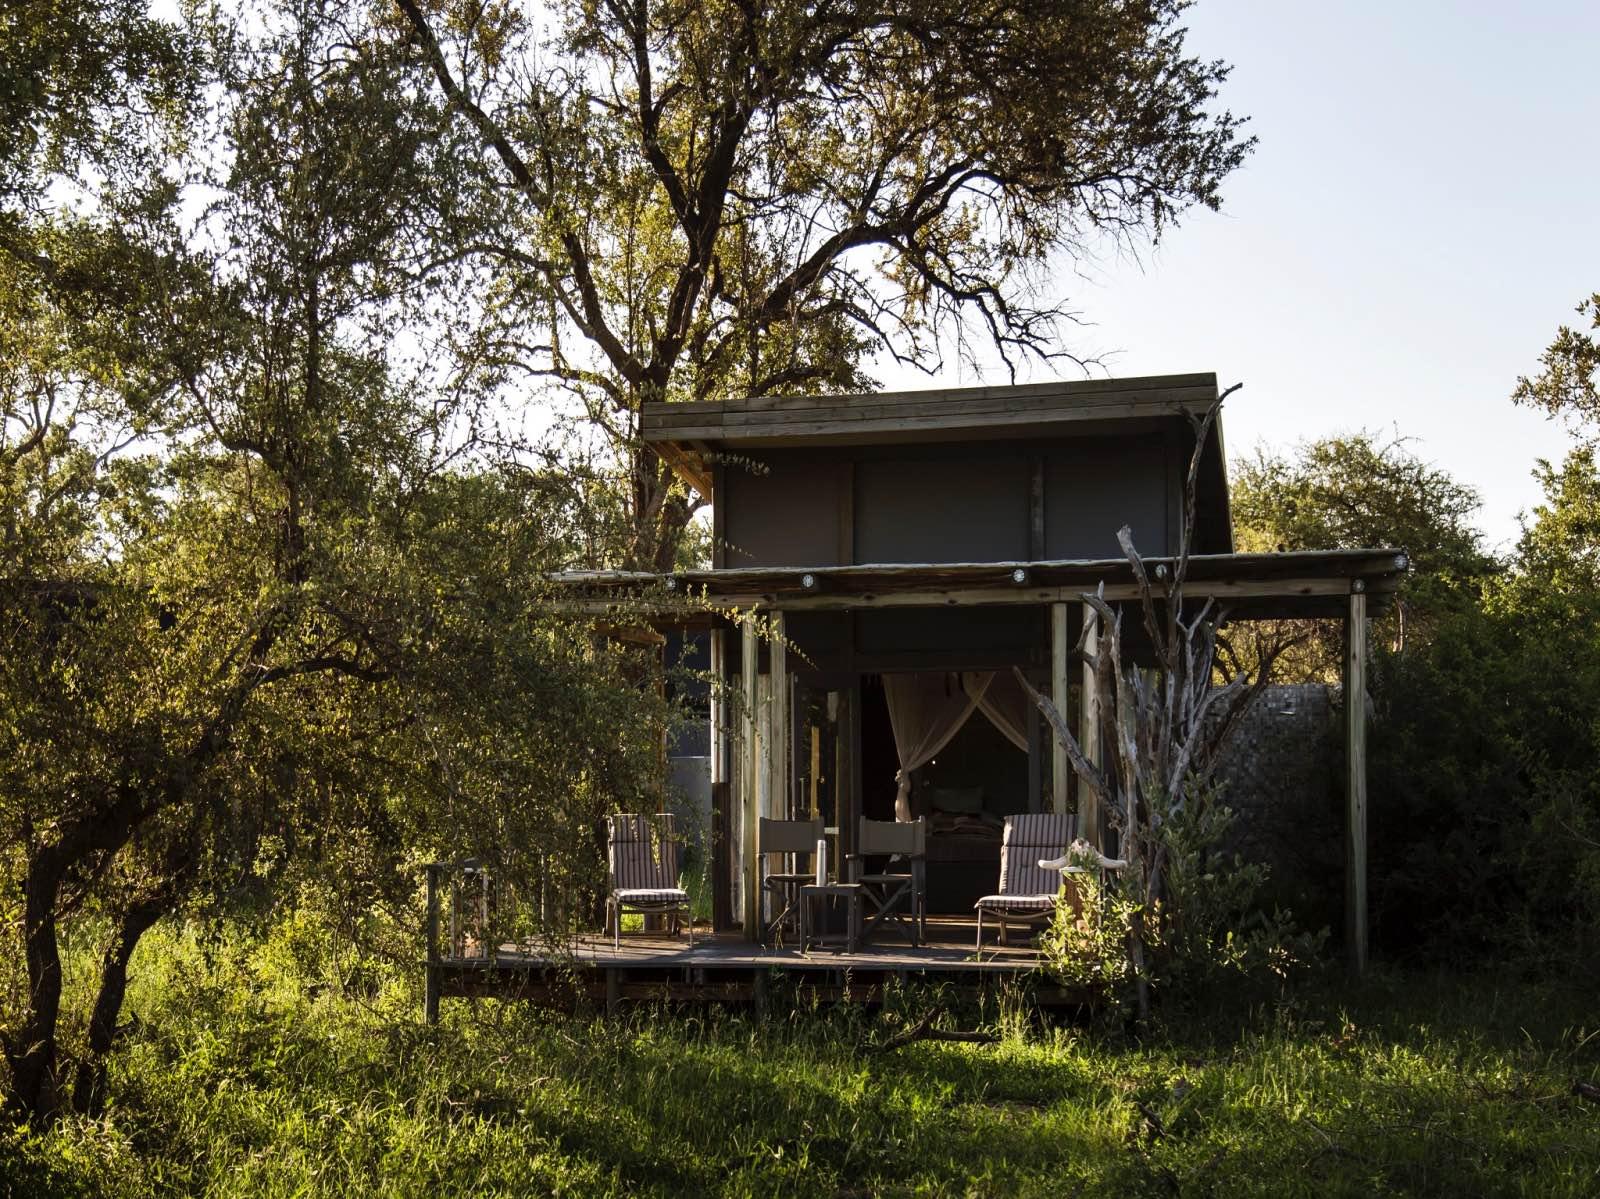 Simbavati River Lodge's luxury safari tent disguised in the lush summer bushveld